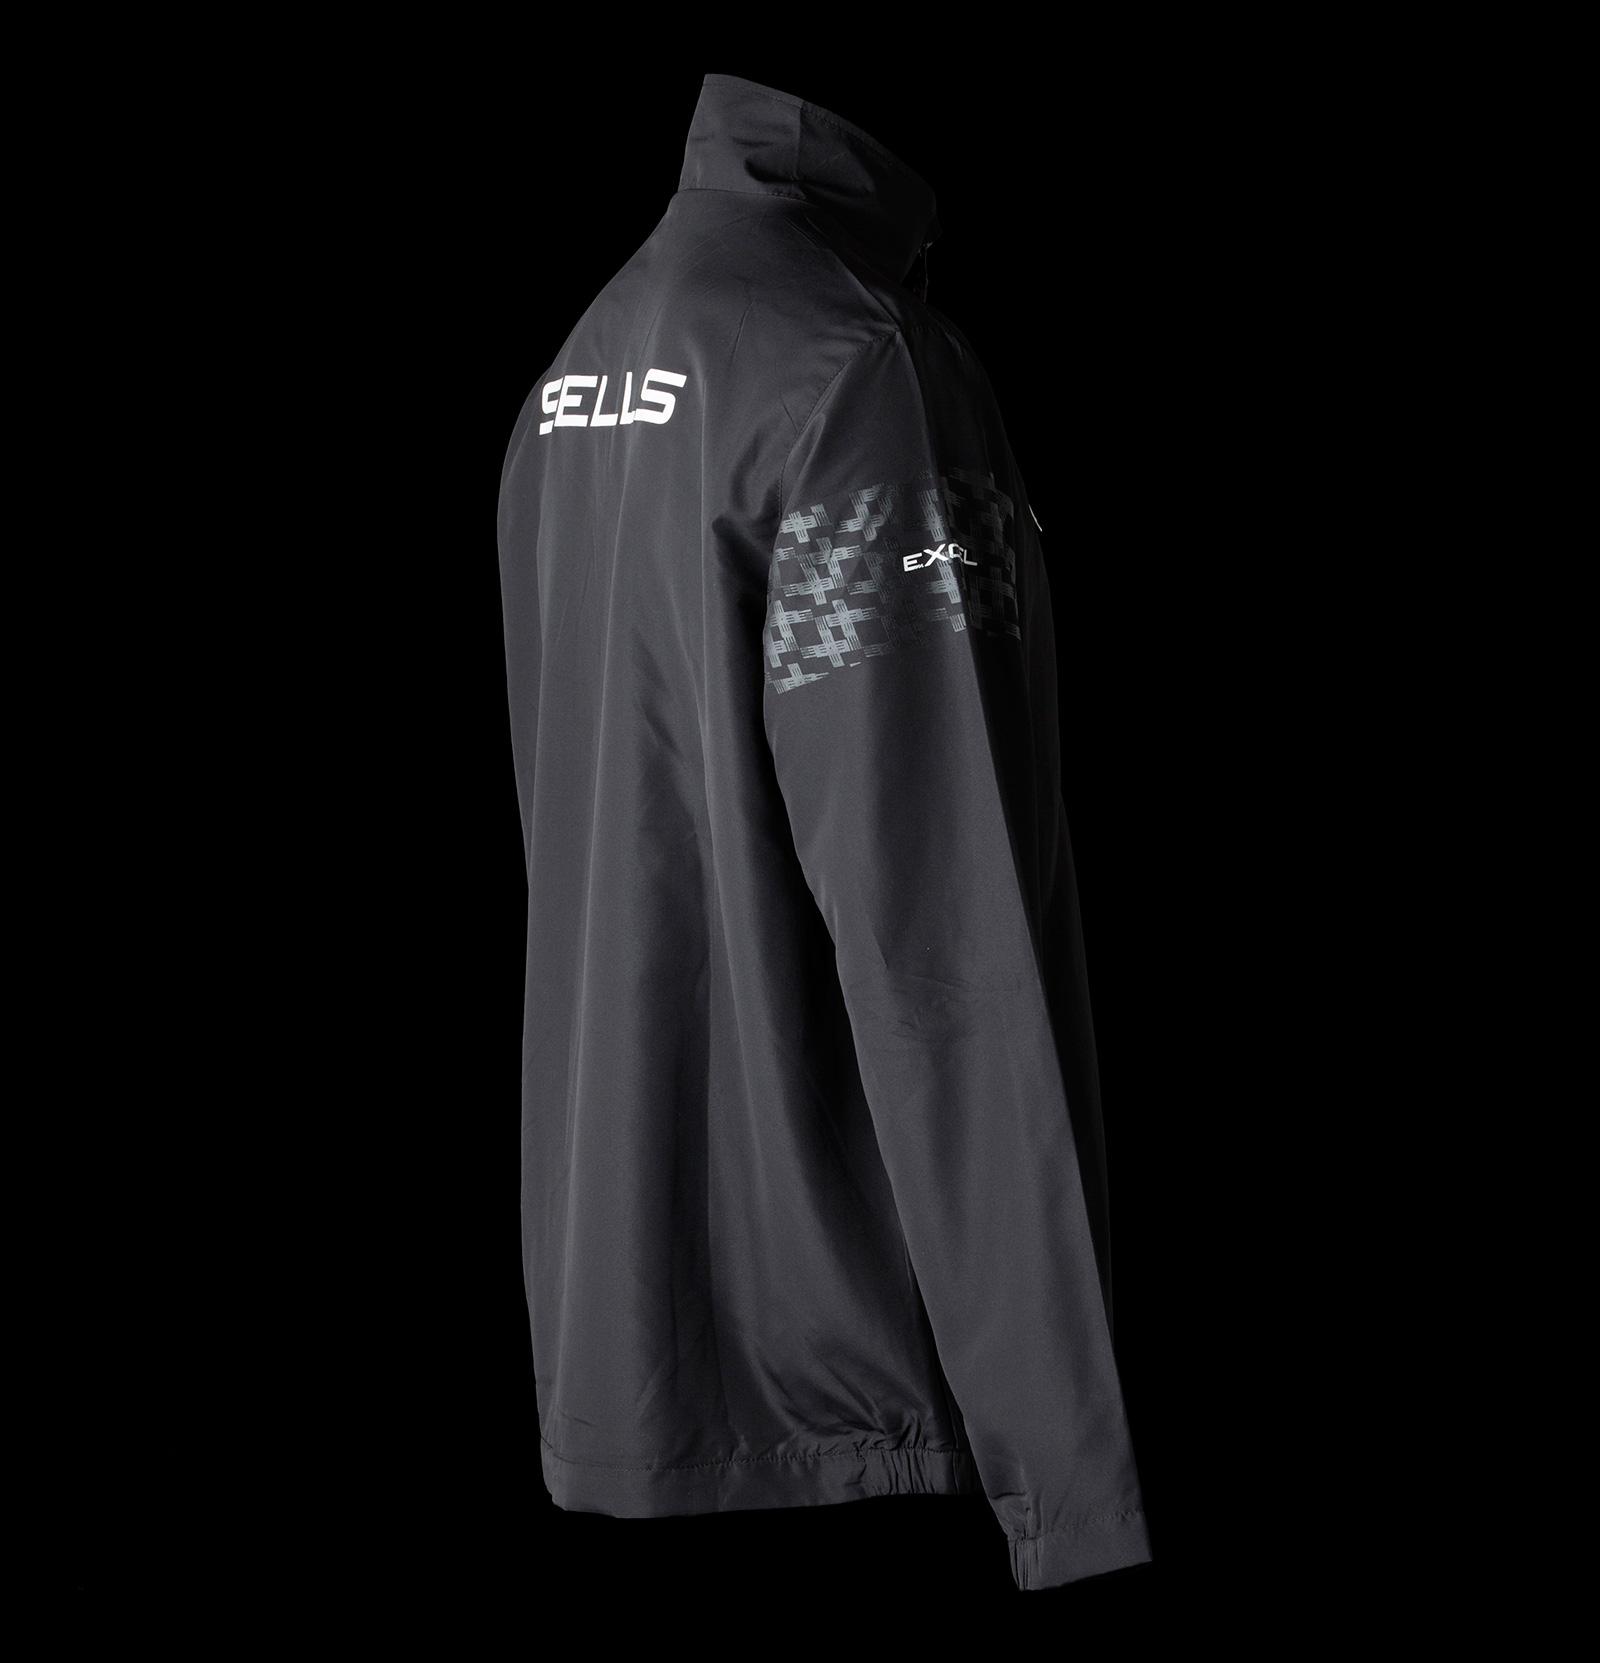 Excel-Travel-Suit-Promo-51